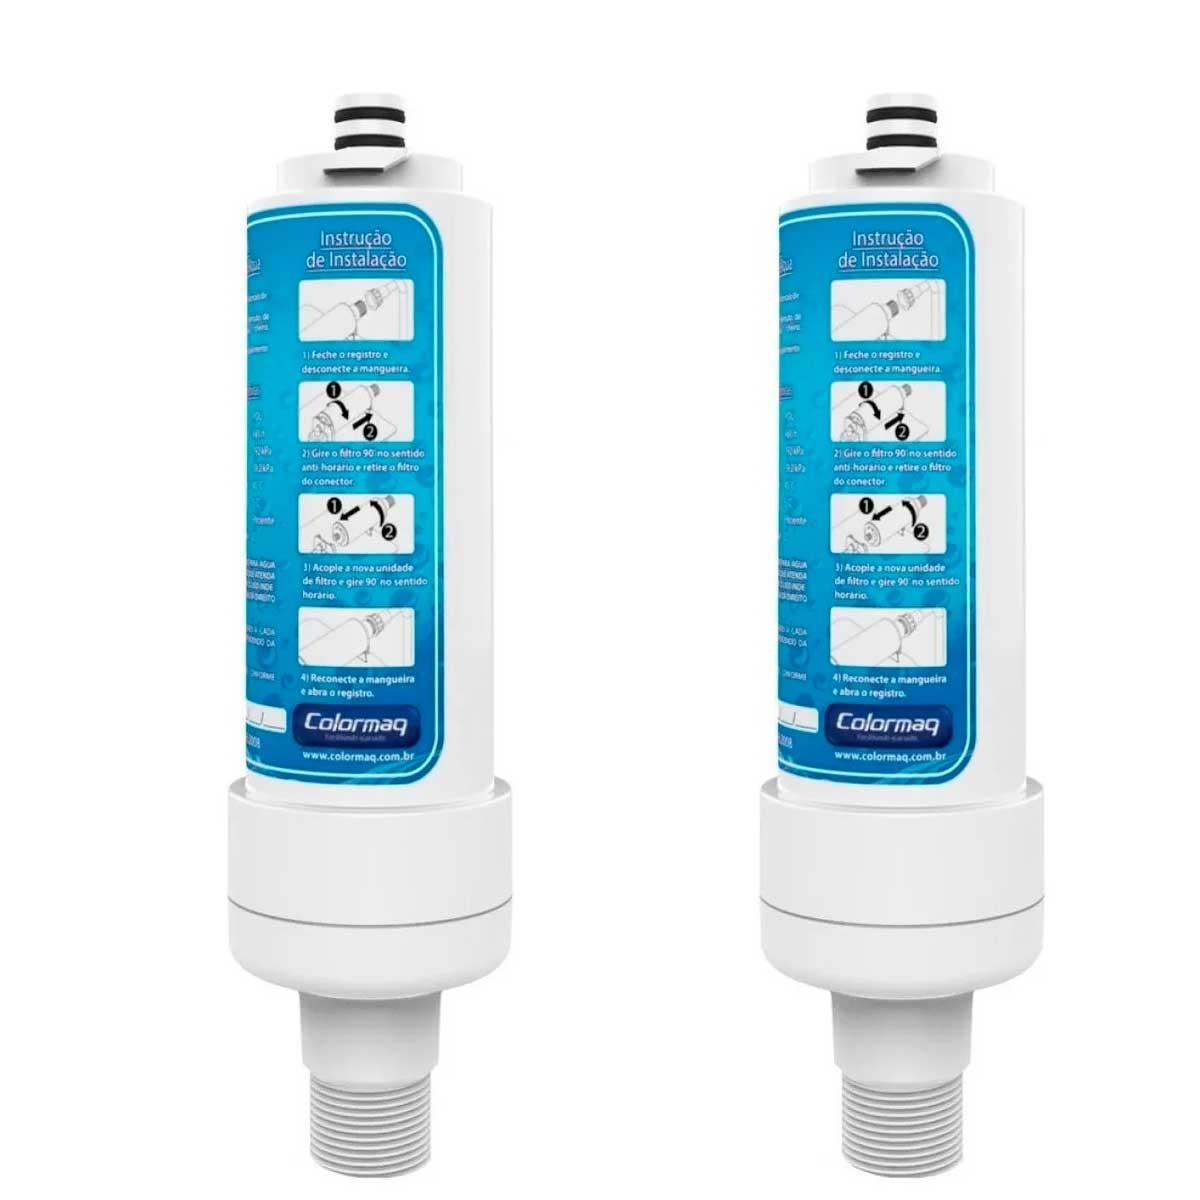 2 Refil Filtro Do Purificador D Água Colormaq Premium Original V2 125.0.001.1